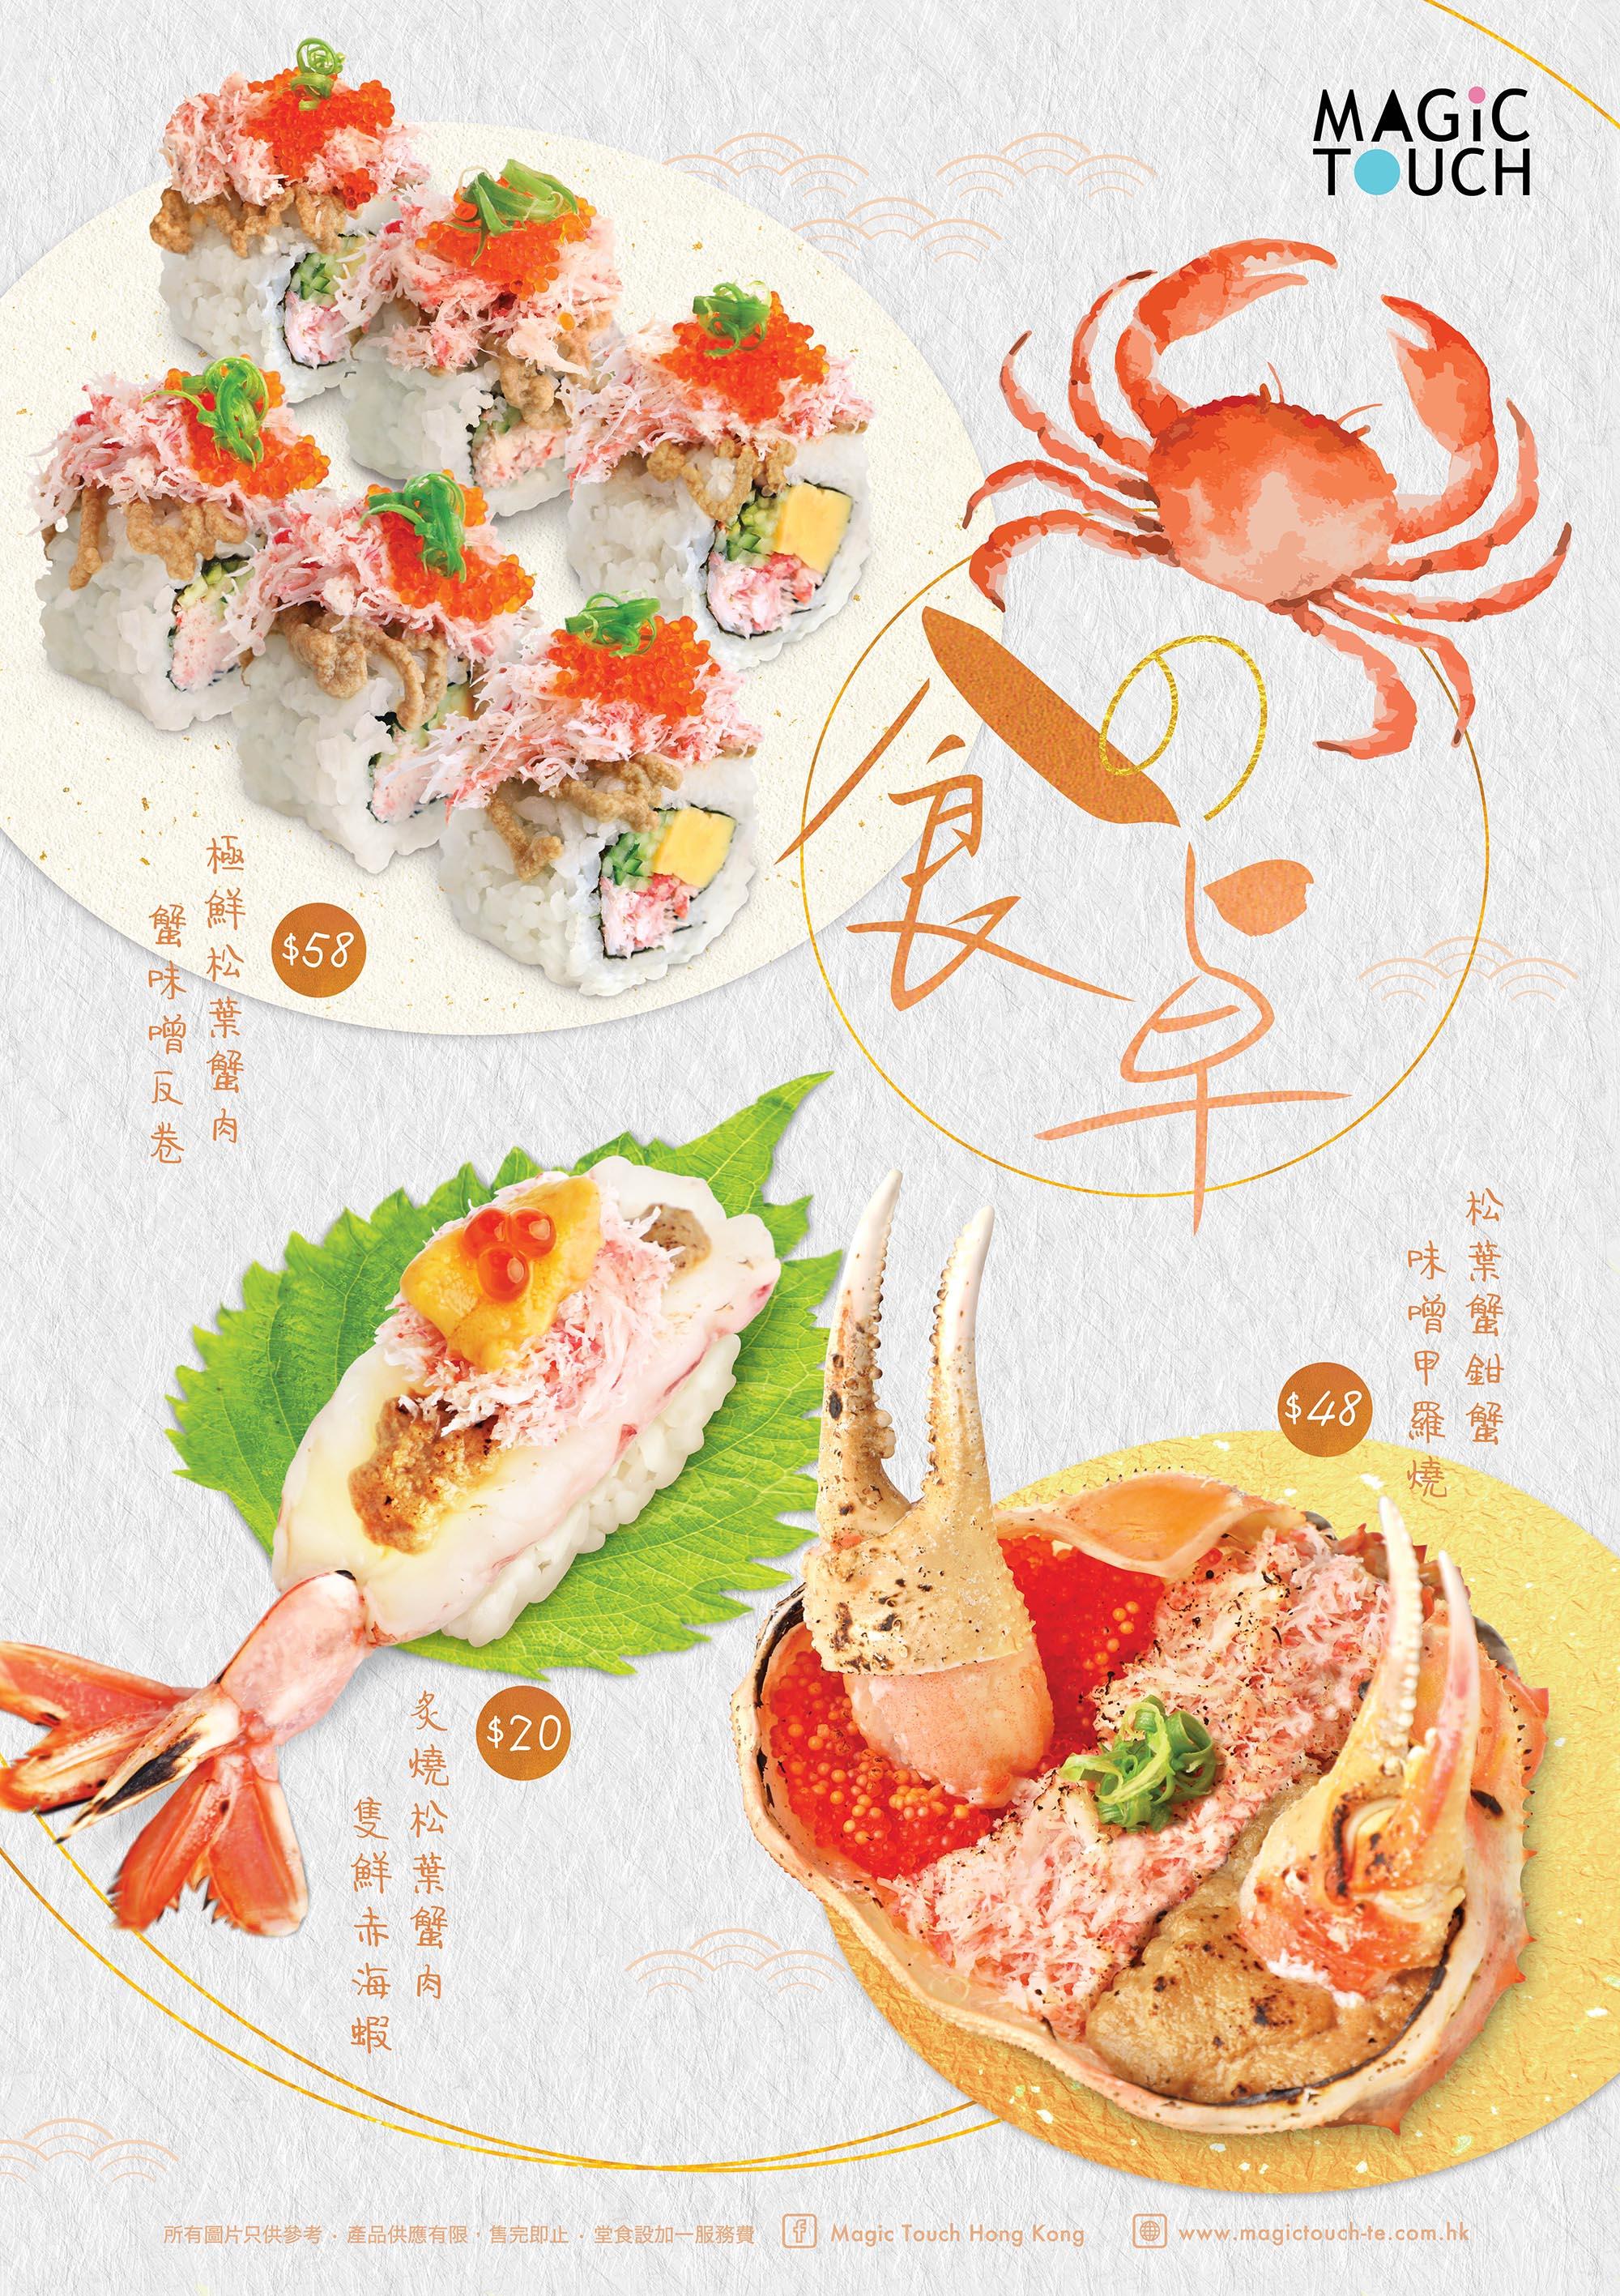 【🚅MAGIC TOUCH — 蟹の食卓🦀】